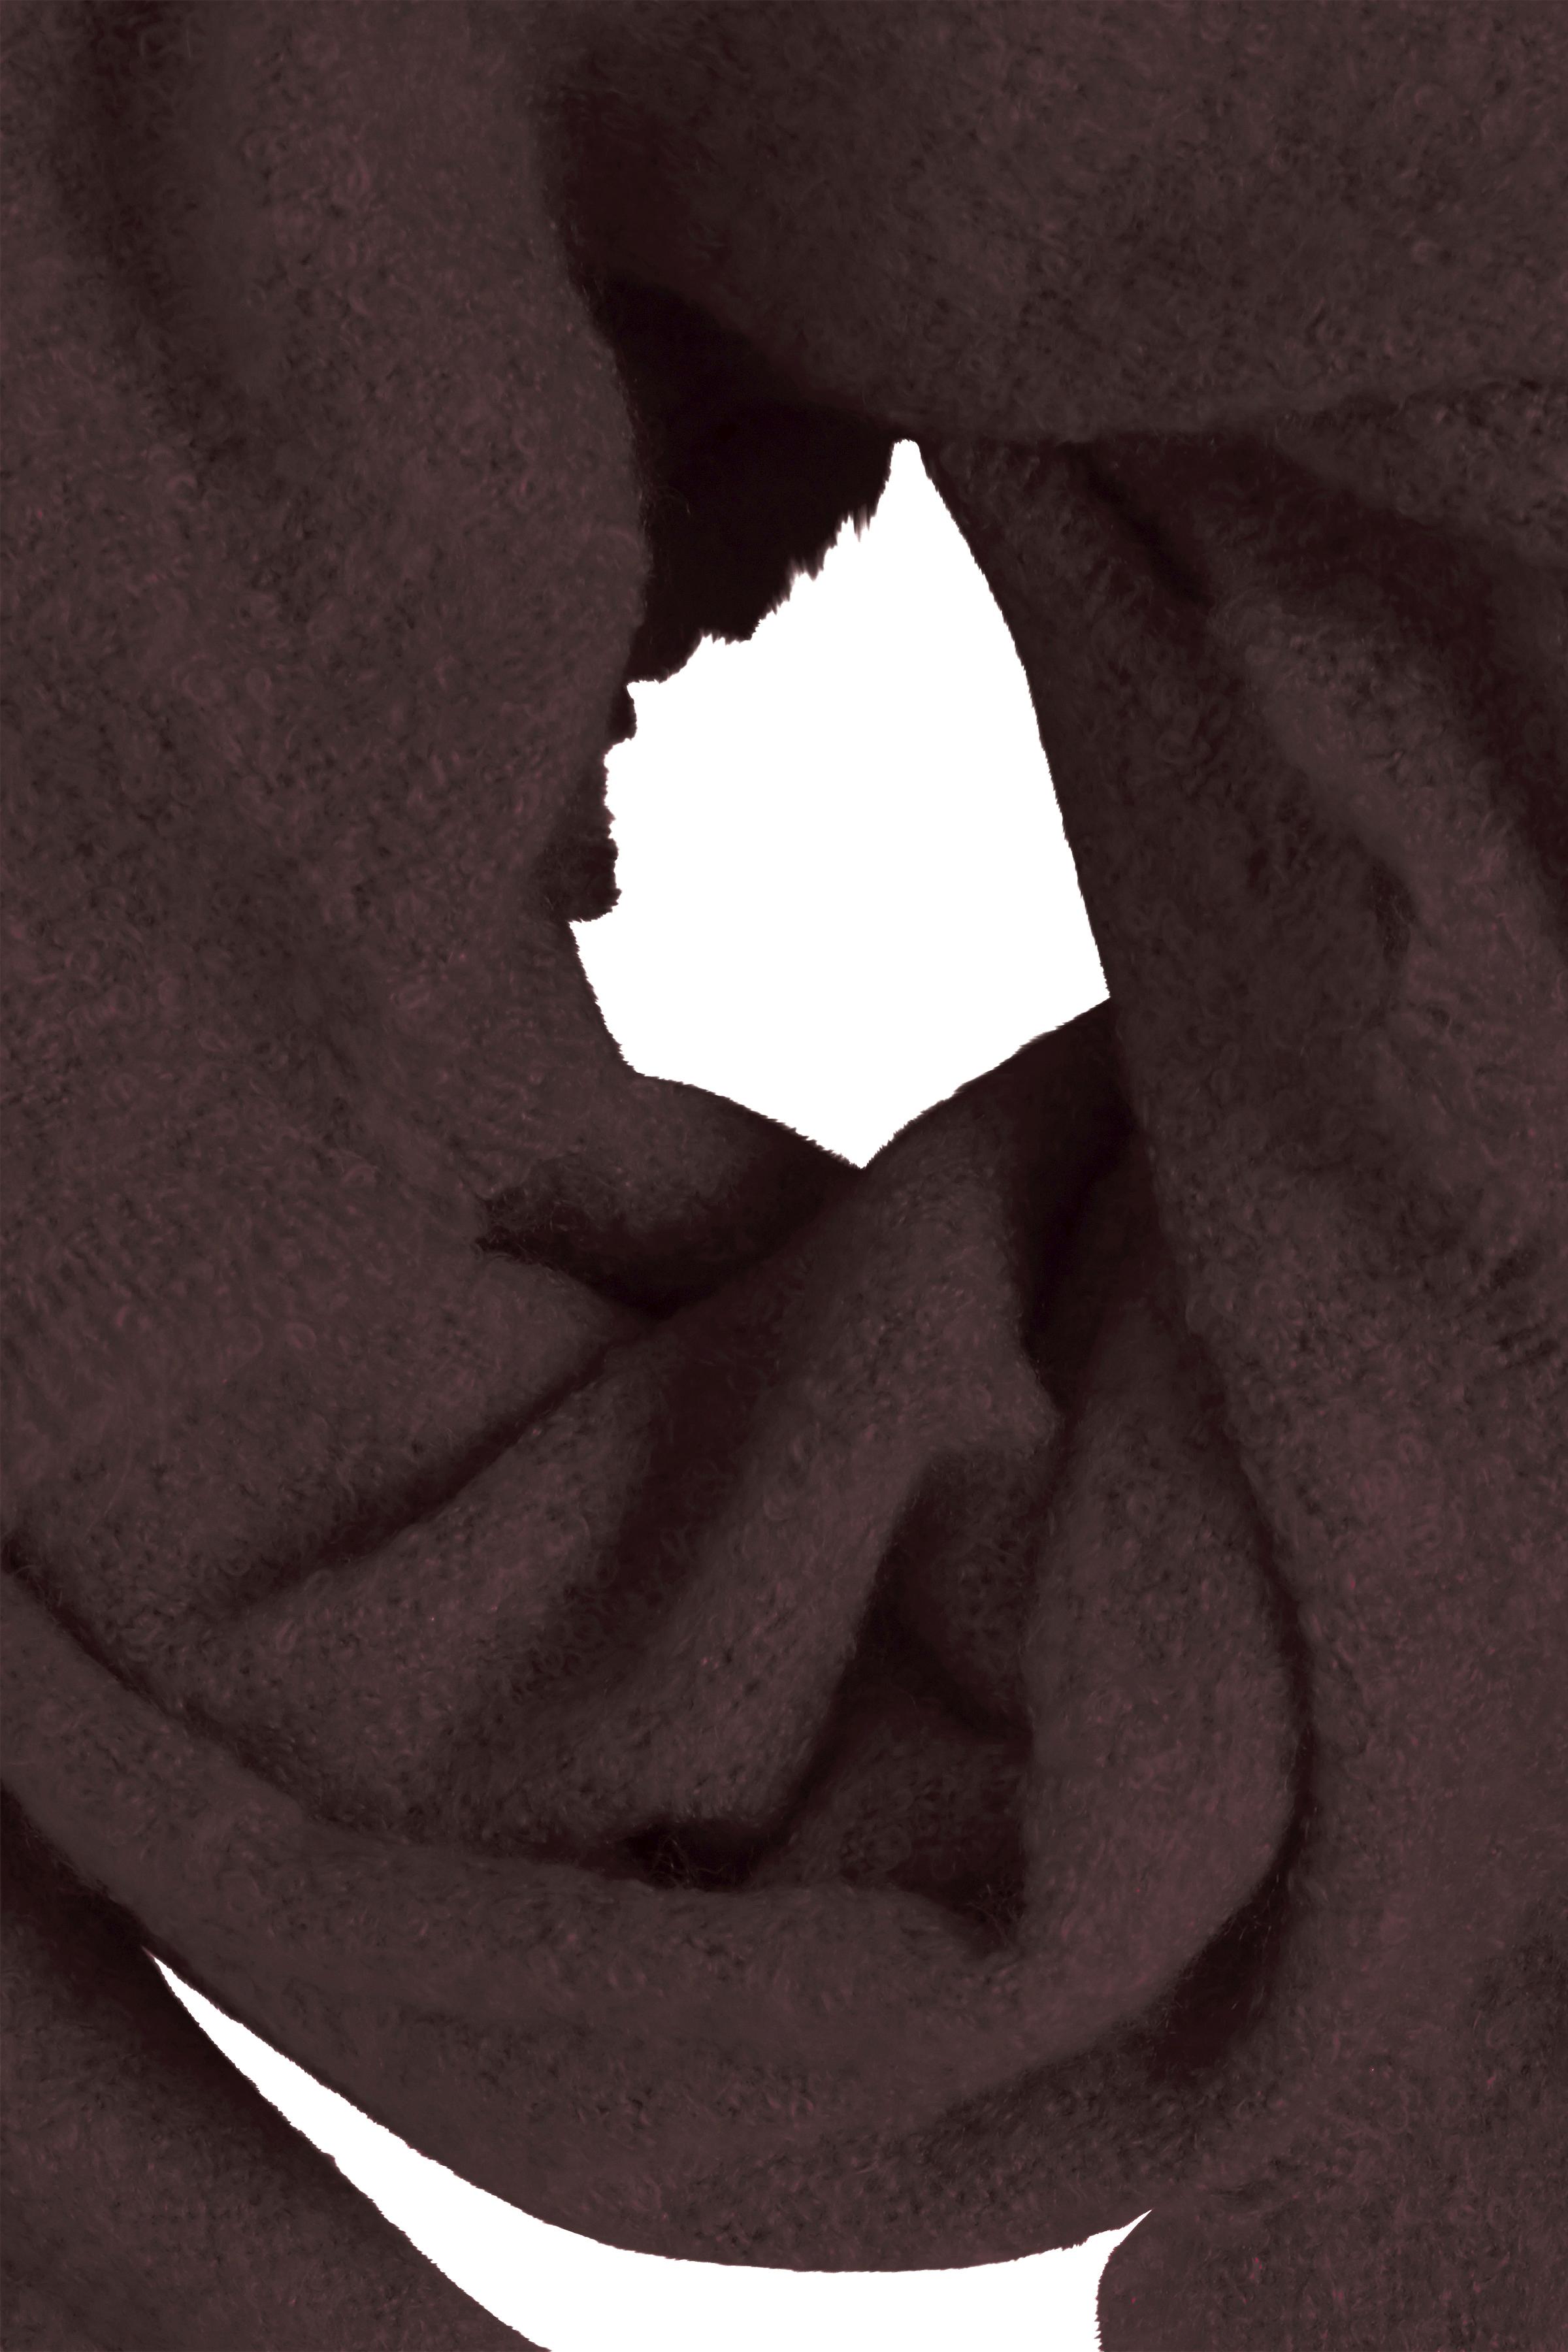 Mørkebrun Tørklæde fra Ichi - accessories – Køb Mørkebrun Tørklæde fra str. ONE her